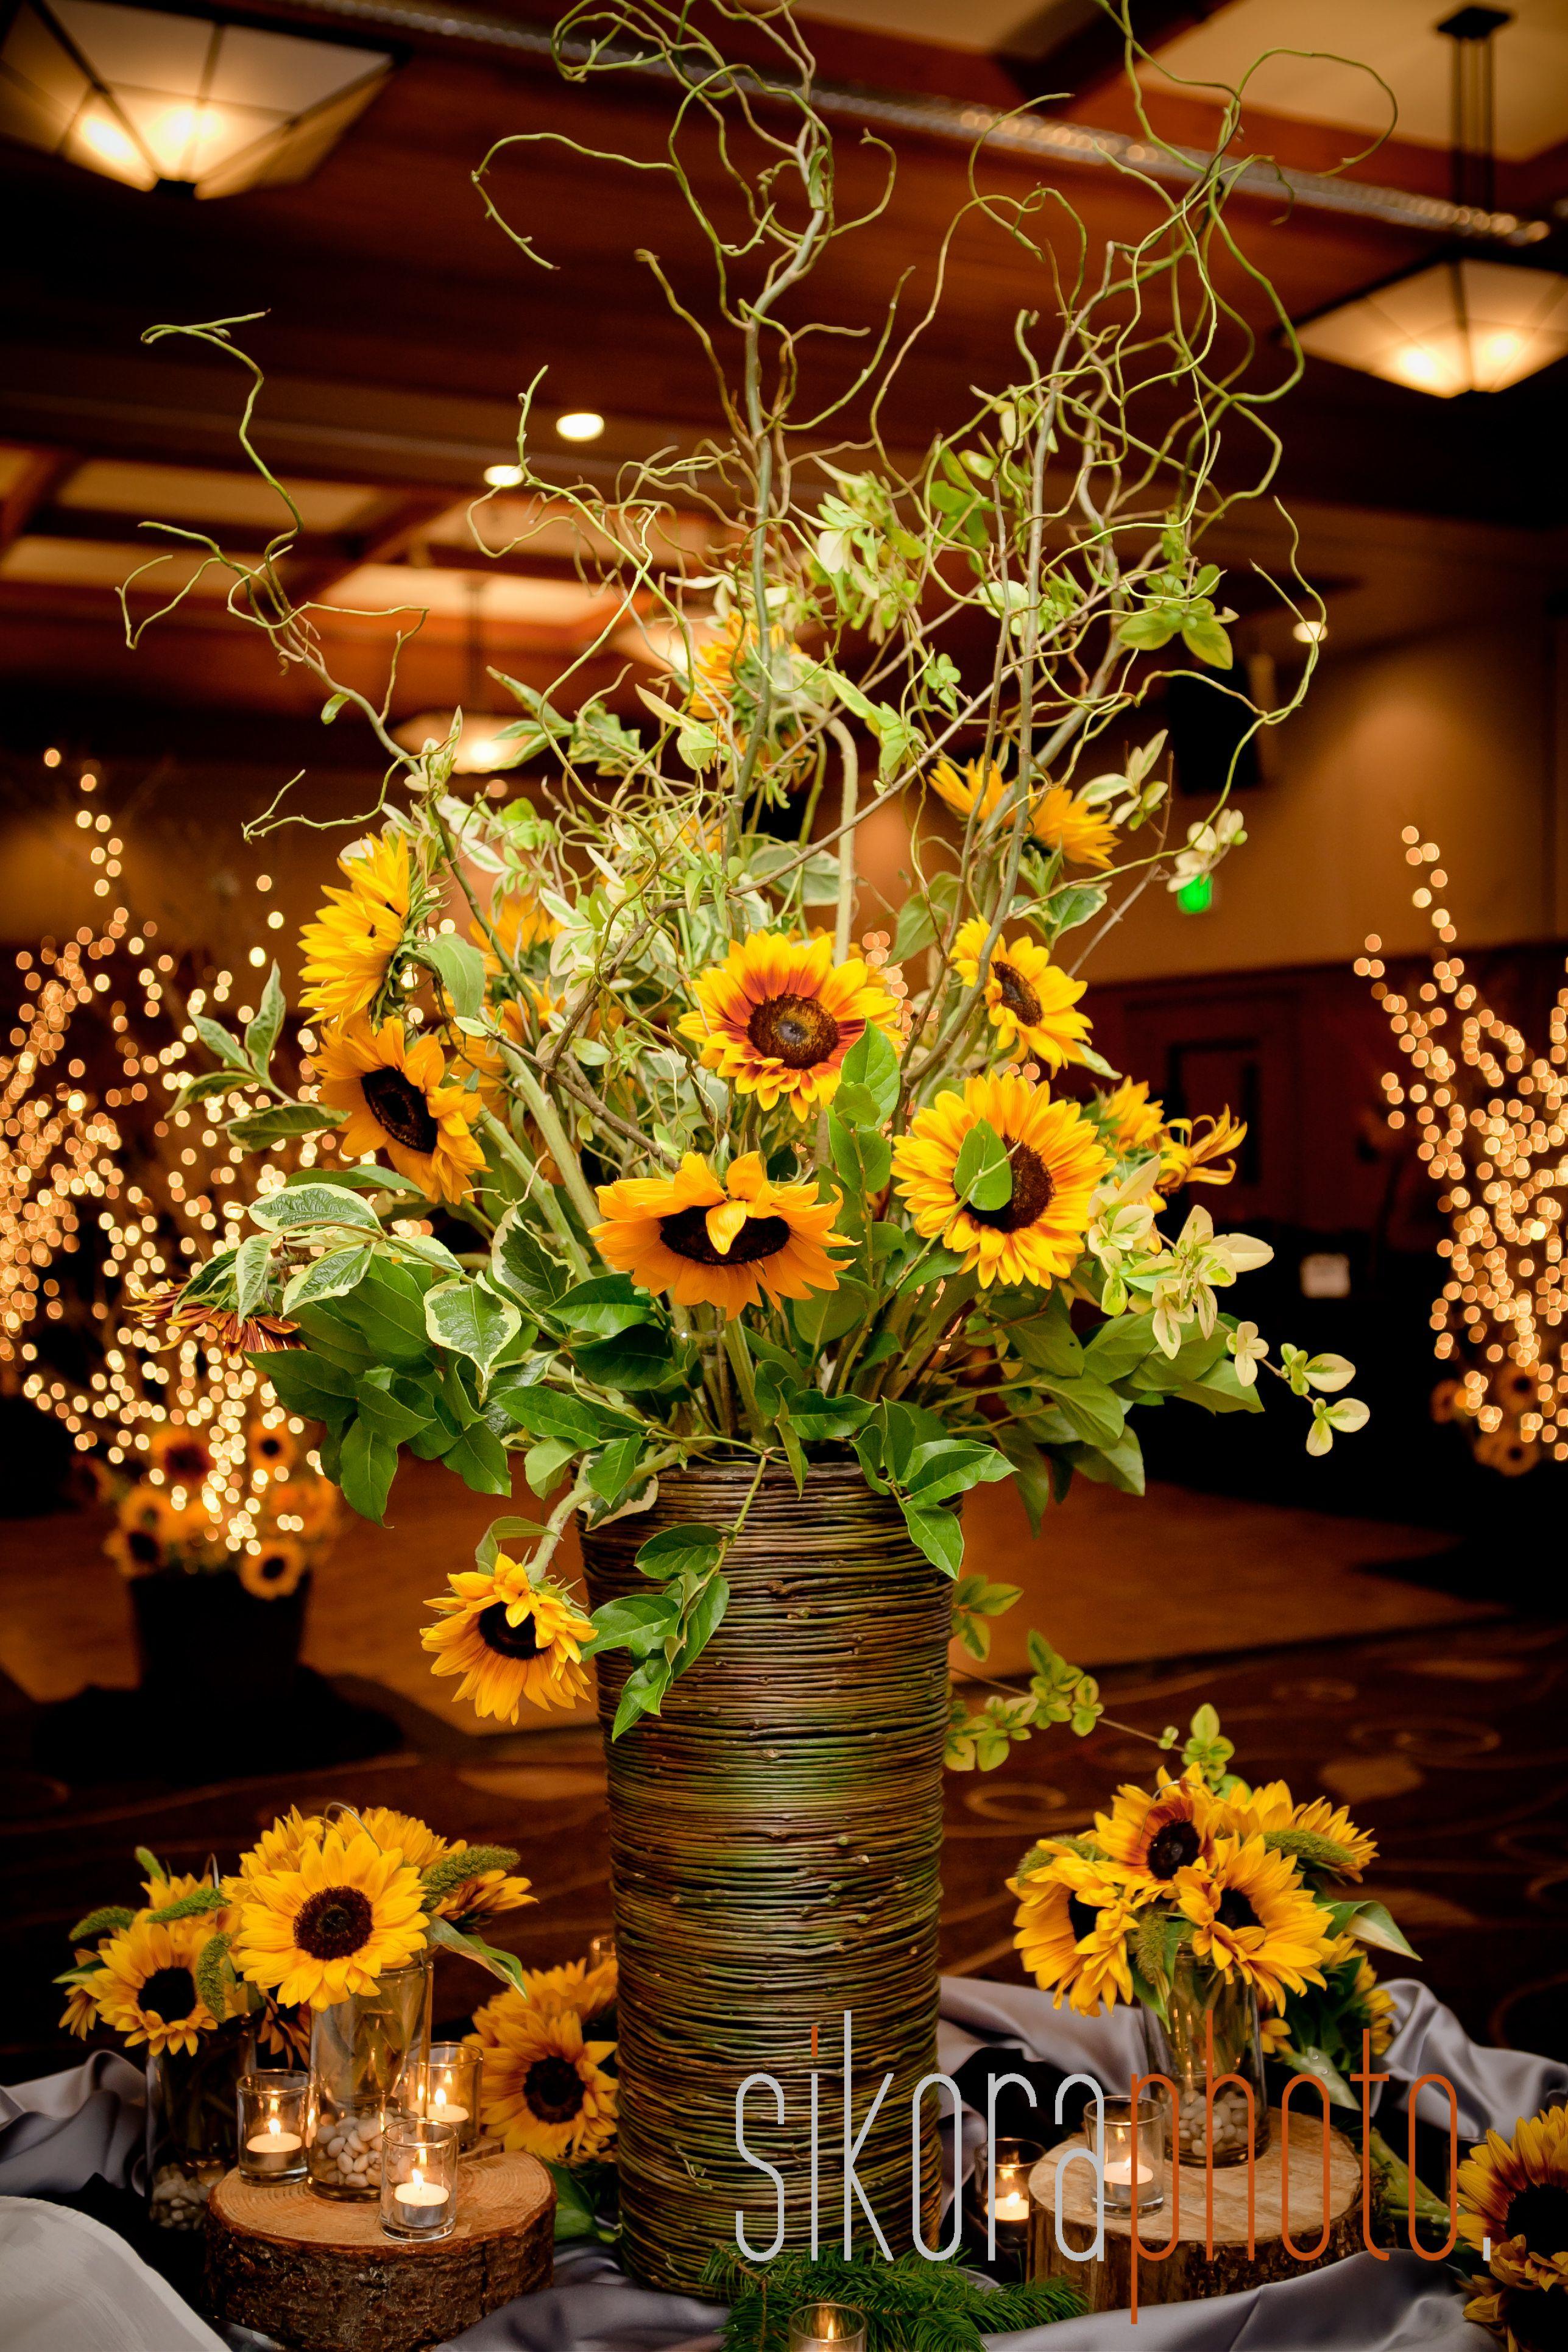 Sunflowers Made Beautiful Floral Arrangements At This Skamania Lodge Wedding Sunflower Wedding Decorations Sunflower Themed Wedding Rustic Sunflower Wedding